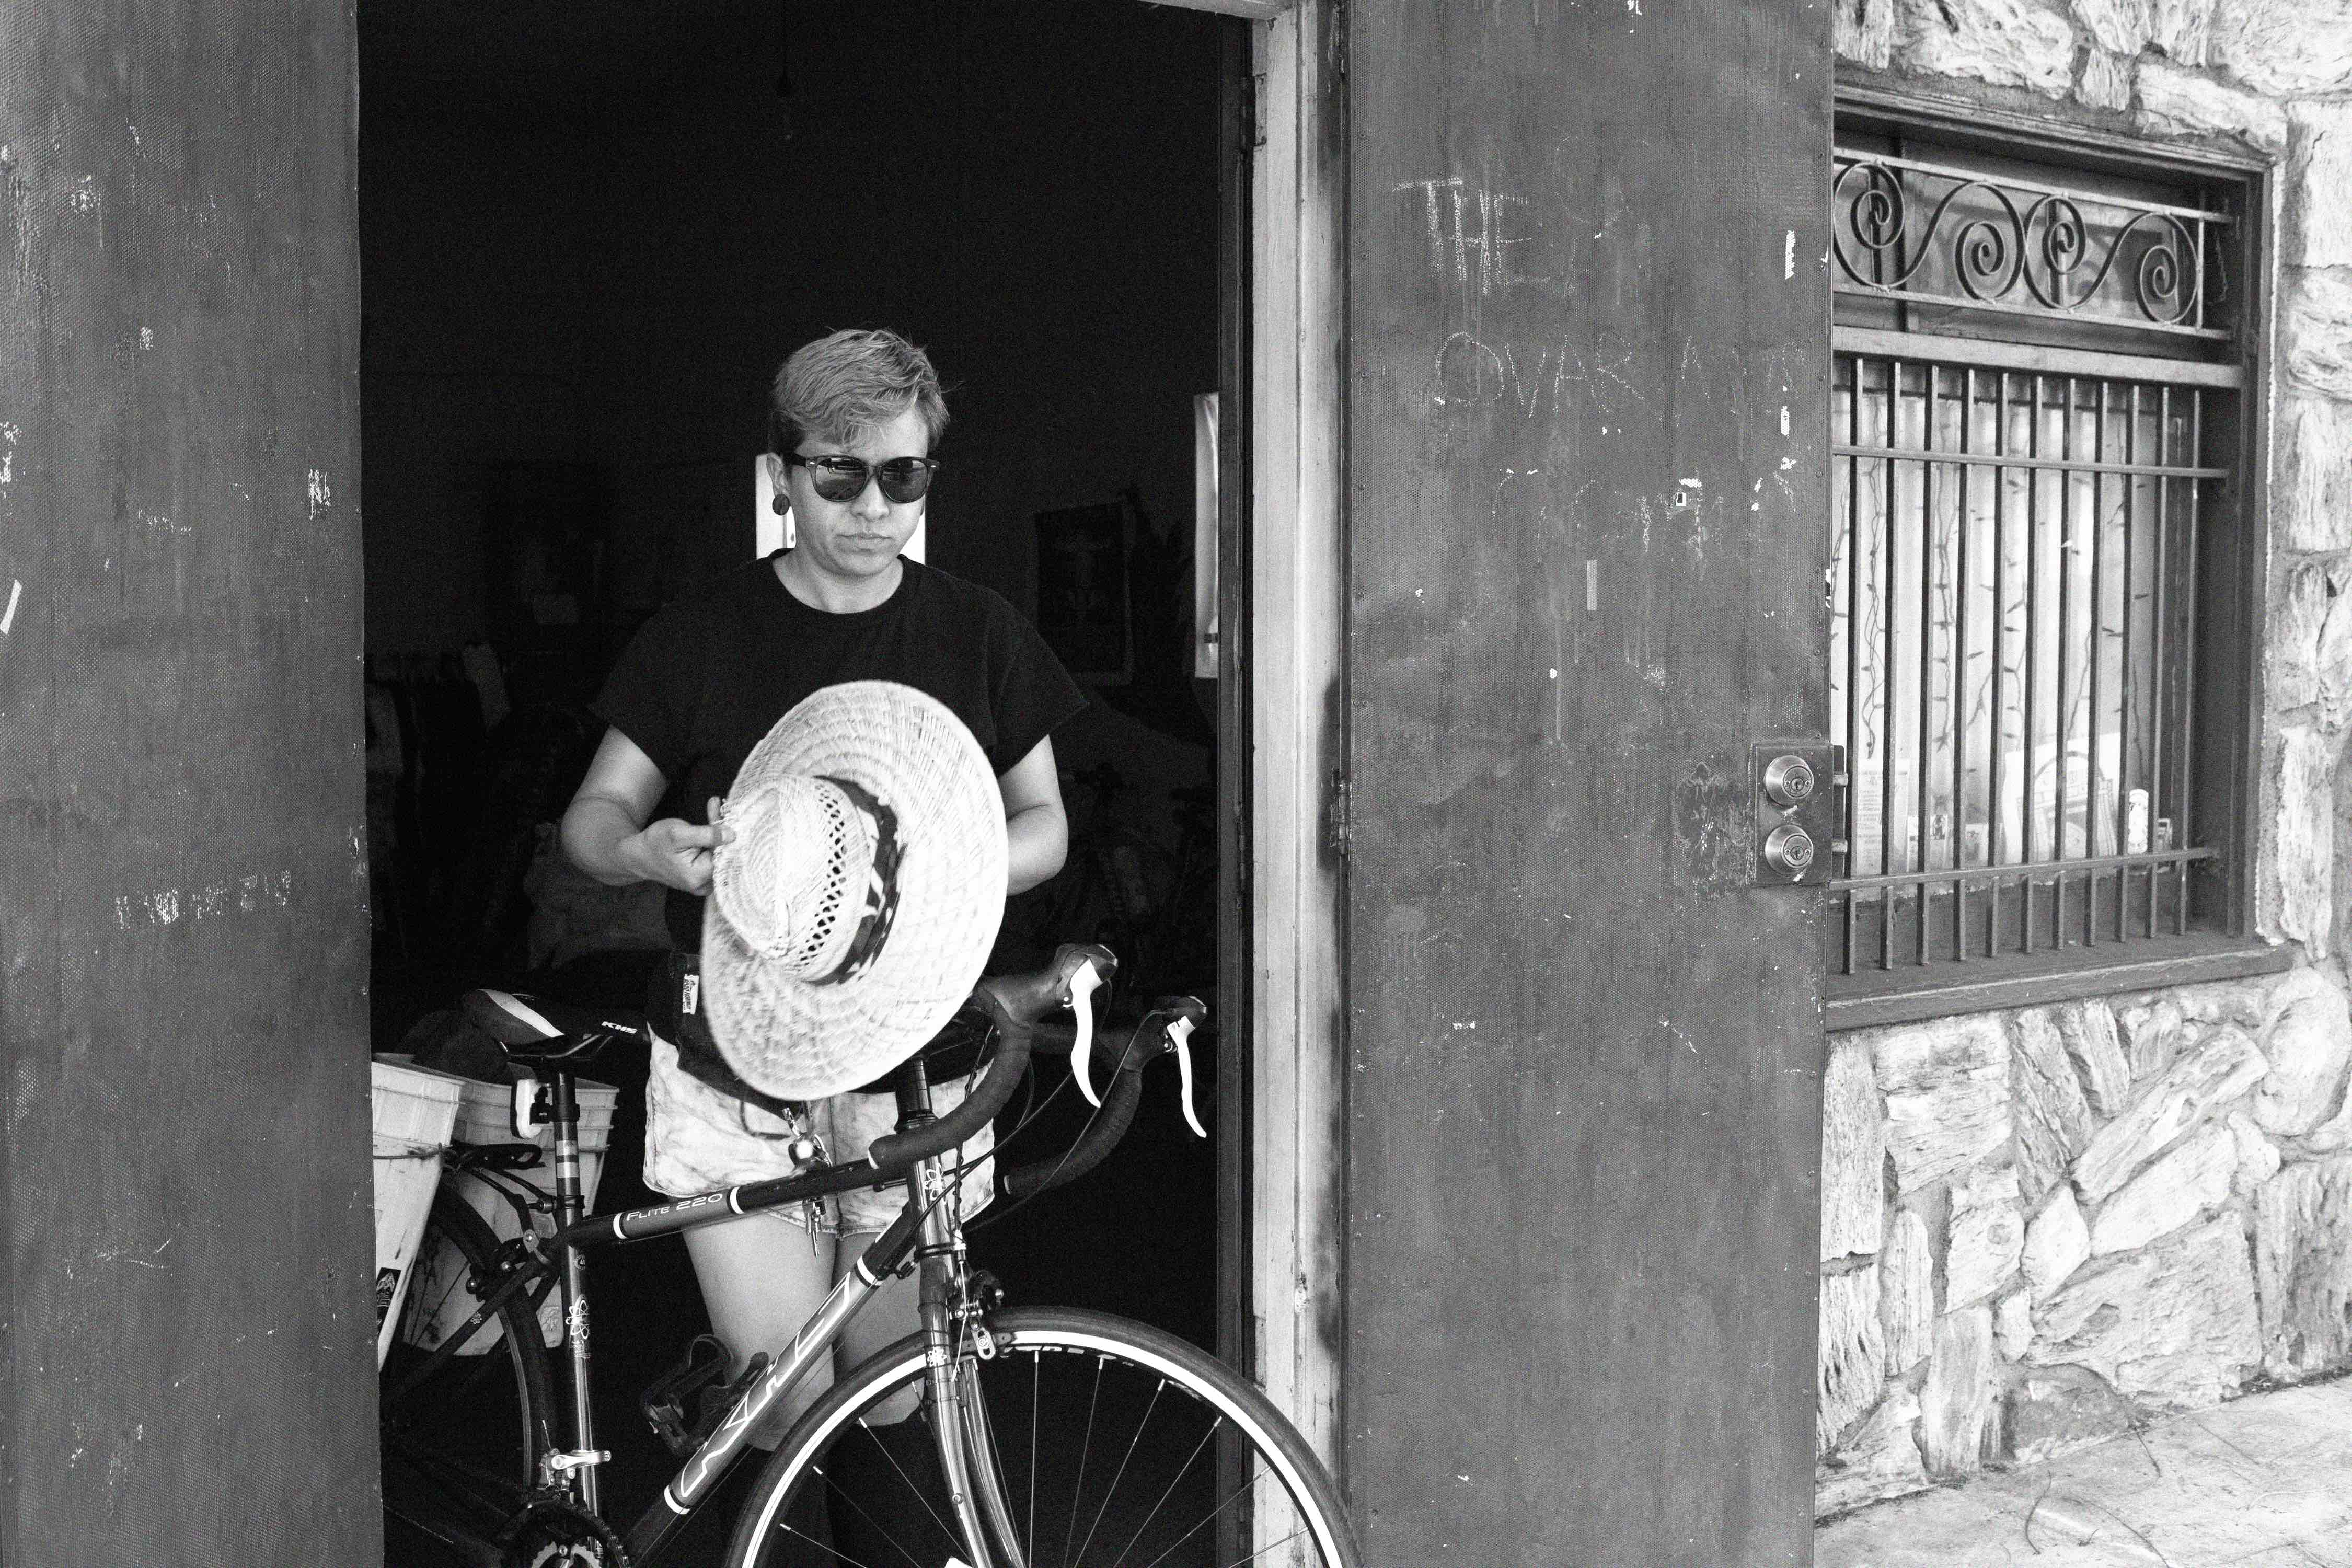 Ovarian Psyco Joan Zeta heads out to play kickball against other bike clubs.